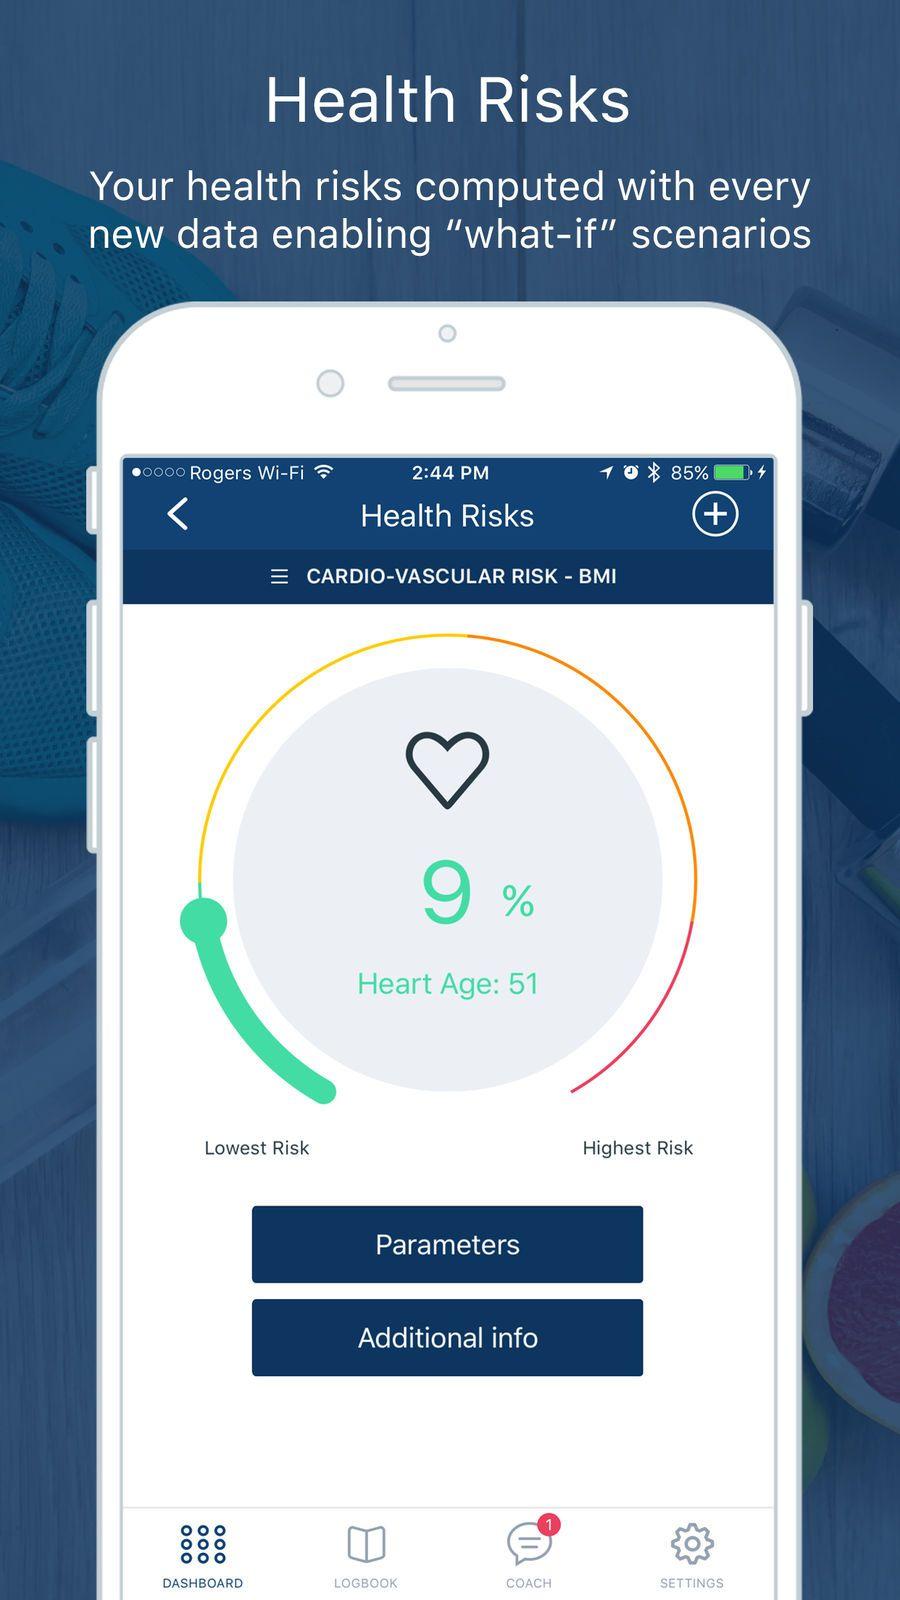 Tactio HEALTH Fitnessampappsios Health, Health risks